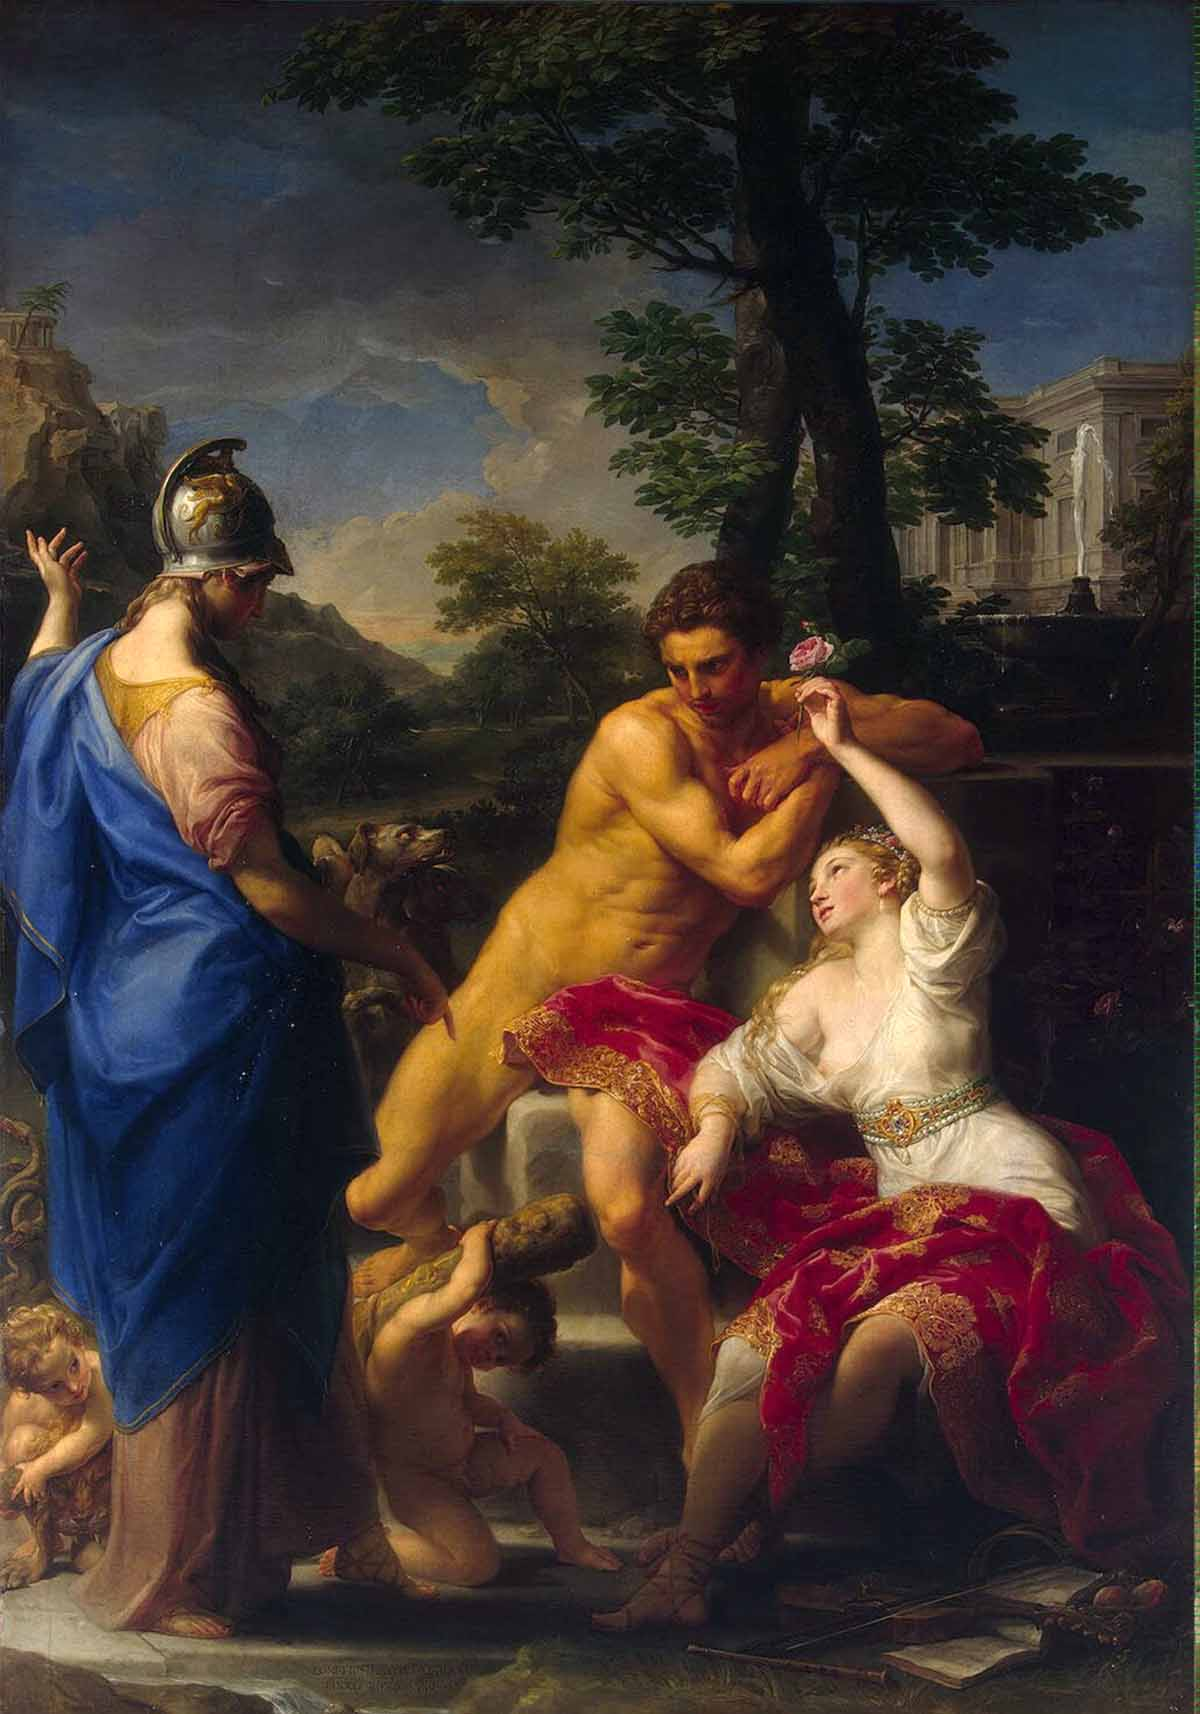 Erotic paintings of andrzej malinowski - 1 3